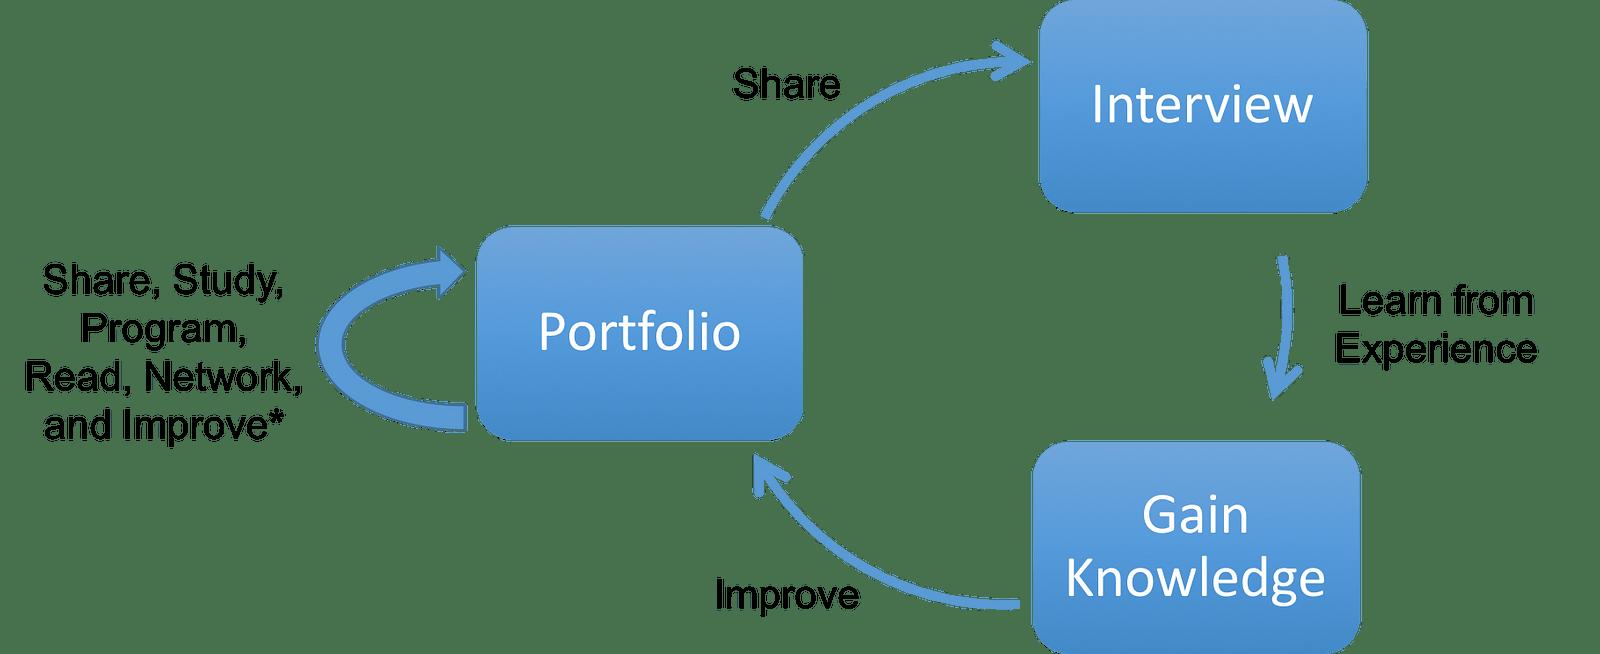 Building Portfolio Interview